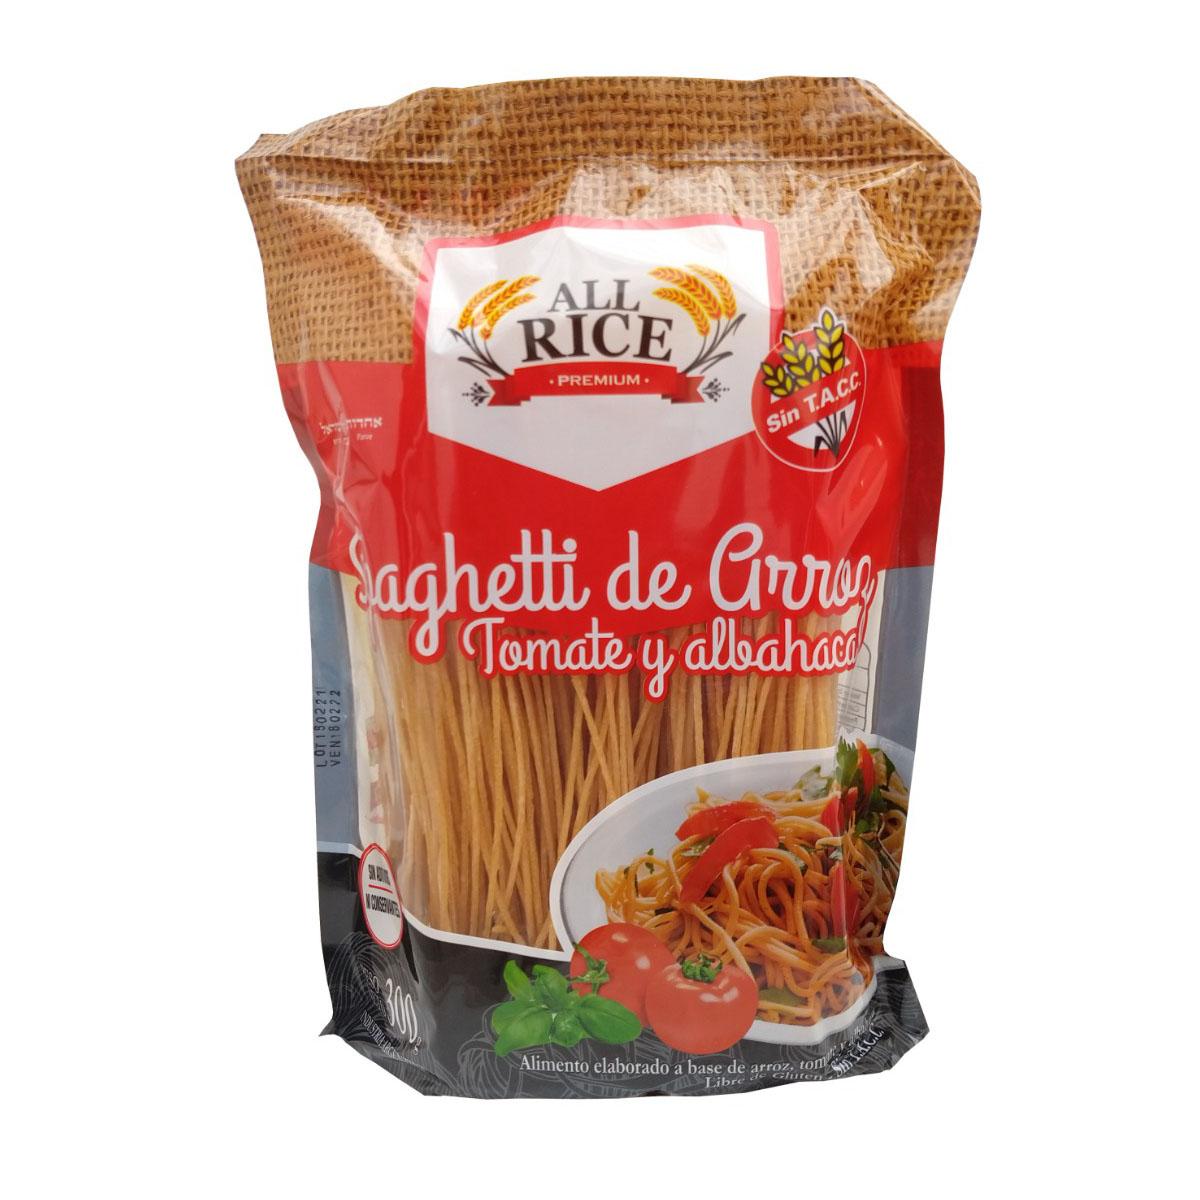 Spaghettis de arroz All Rice Premium son elaborados íntegramente a base de arroz. Vienen en 3 variedades. Clásicos, Tomate&Albahaca y Espinaca. Libres de gluten.